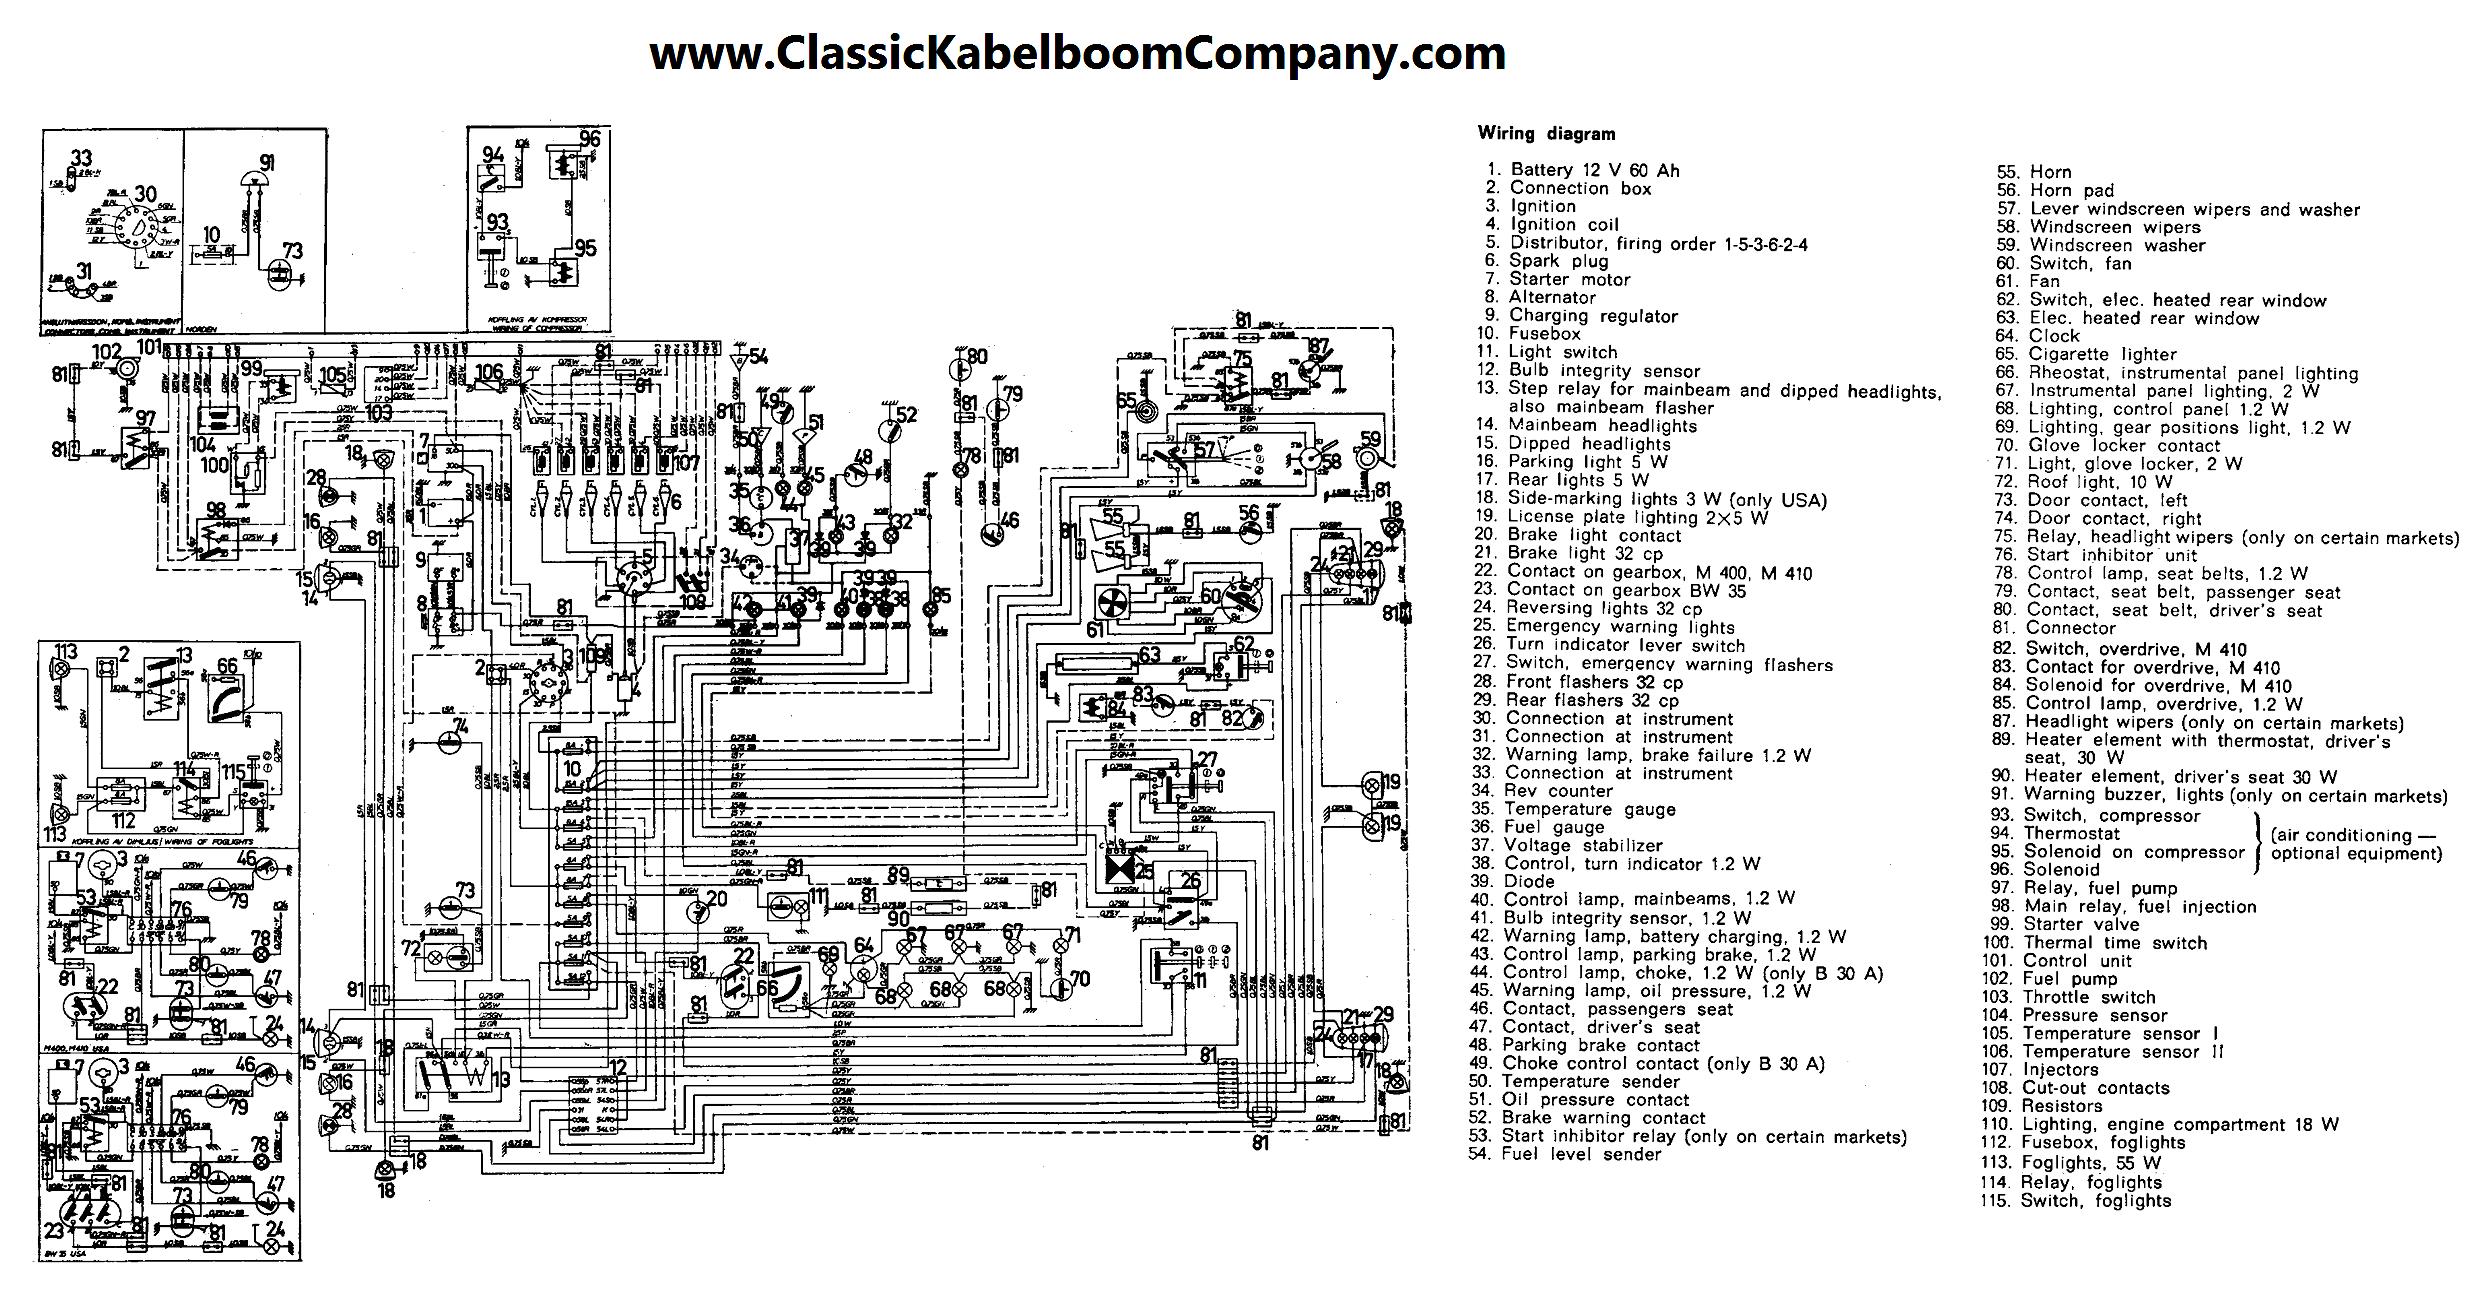 classic kabelboom company elektrisch bedrading schema volvo rh classickabelboomcompany com Volvo S60 Wiring-Diagram Volvo Fuel Pump Wiring Diagram